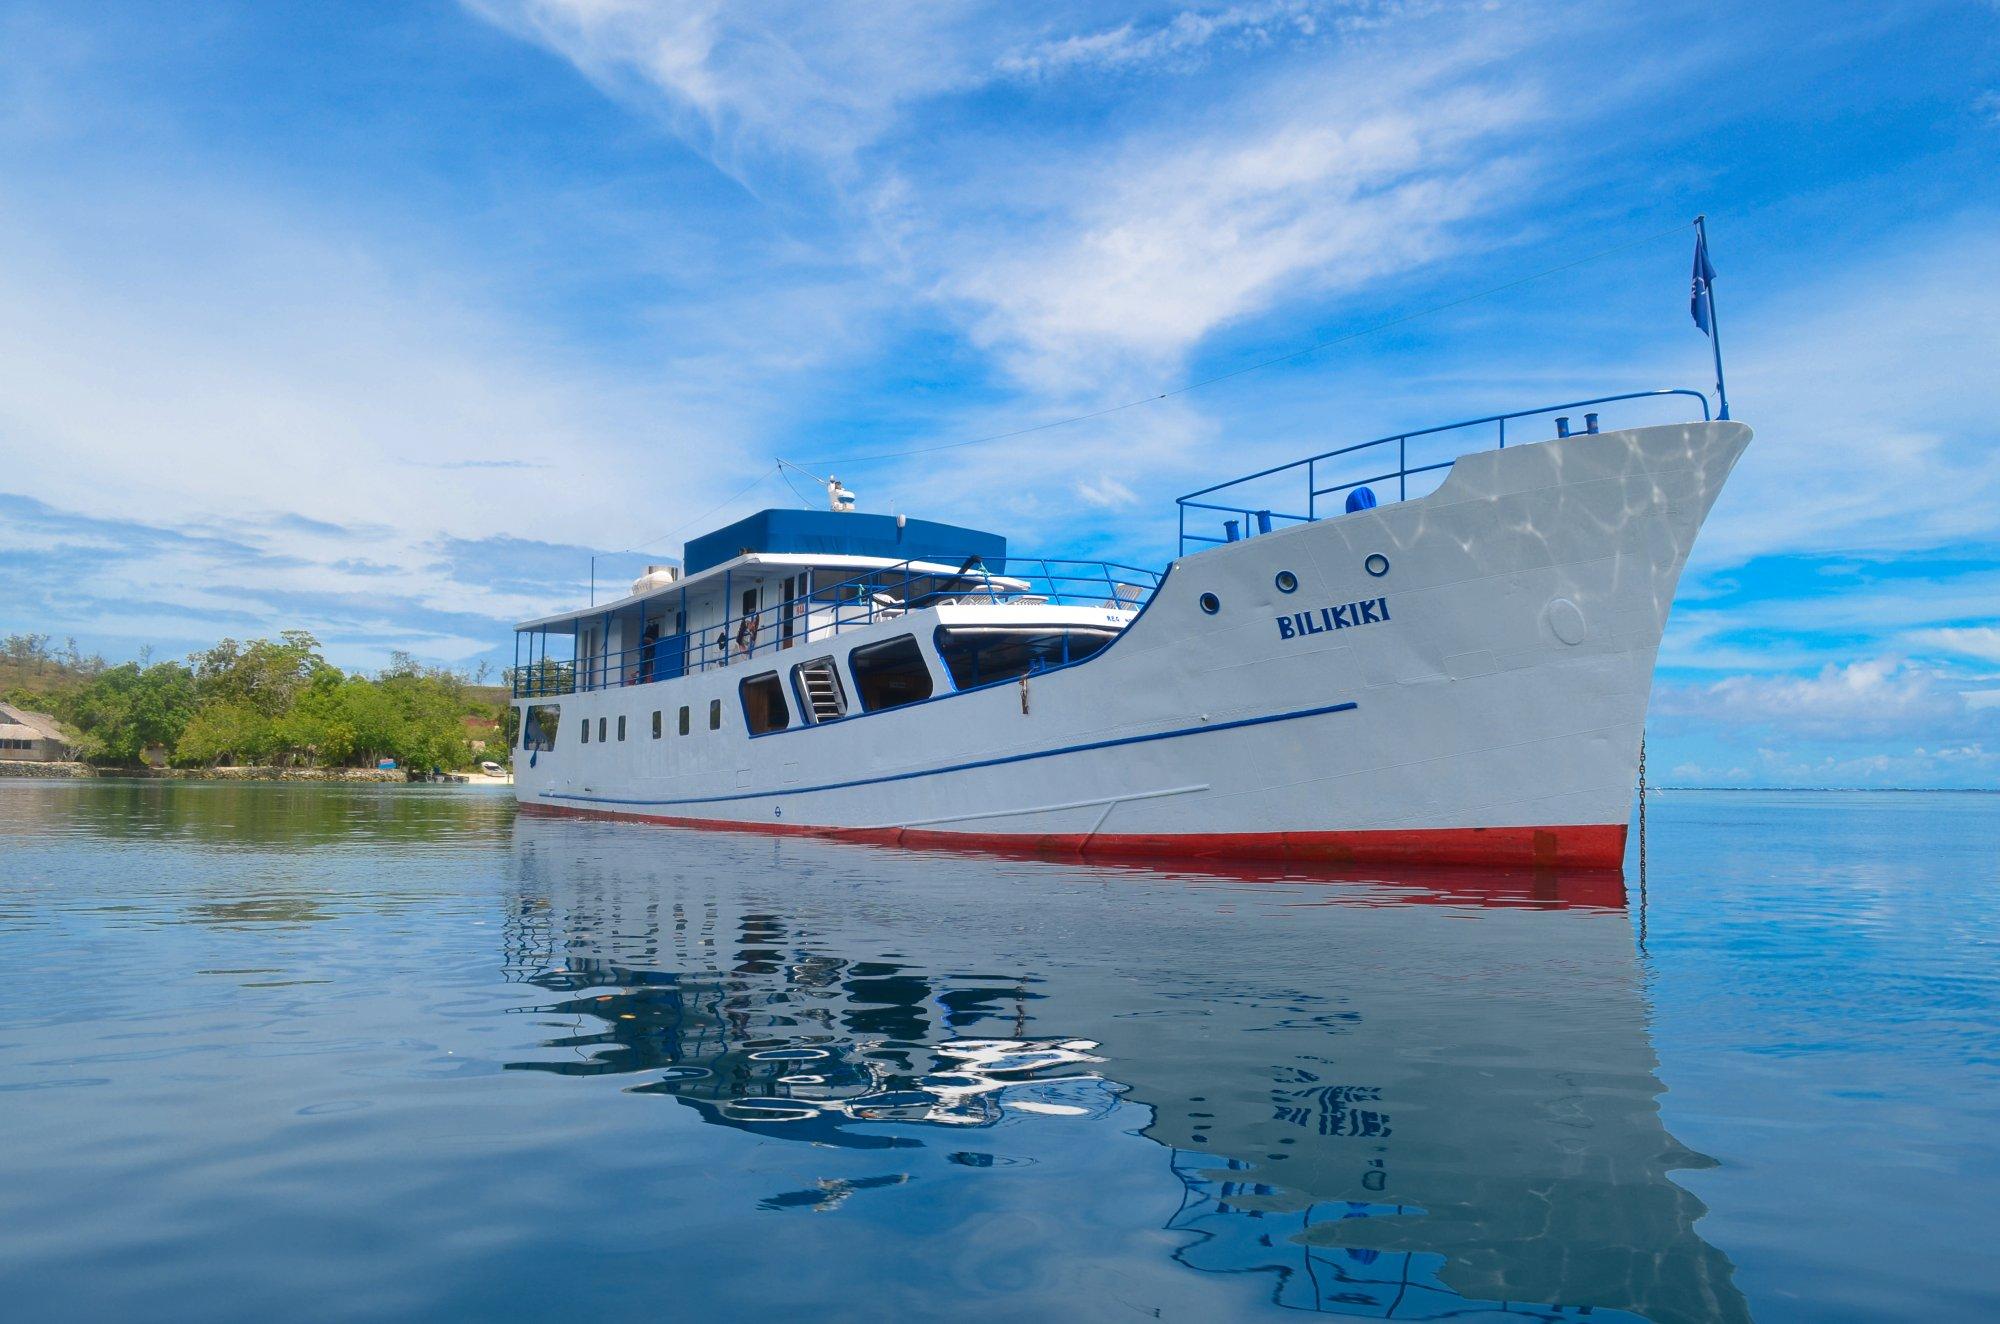 Solomon Islands Deposit - Male spot only remaining